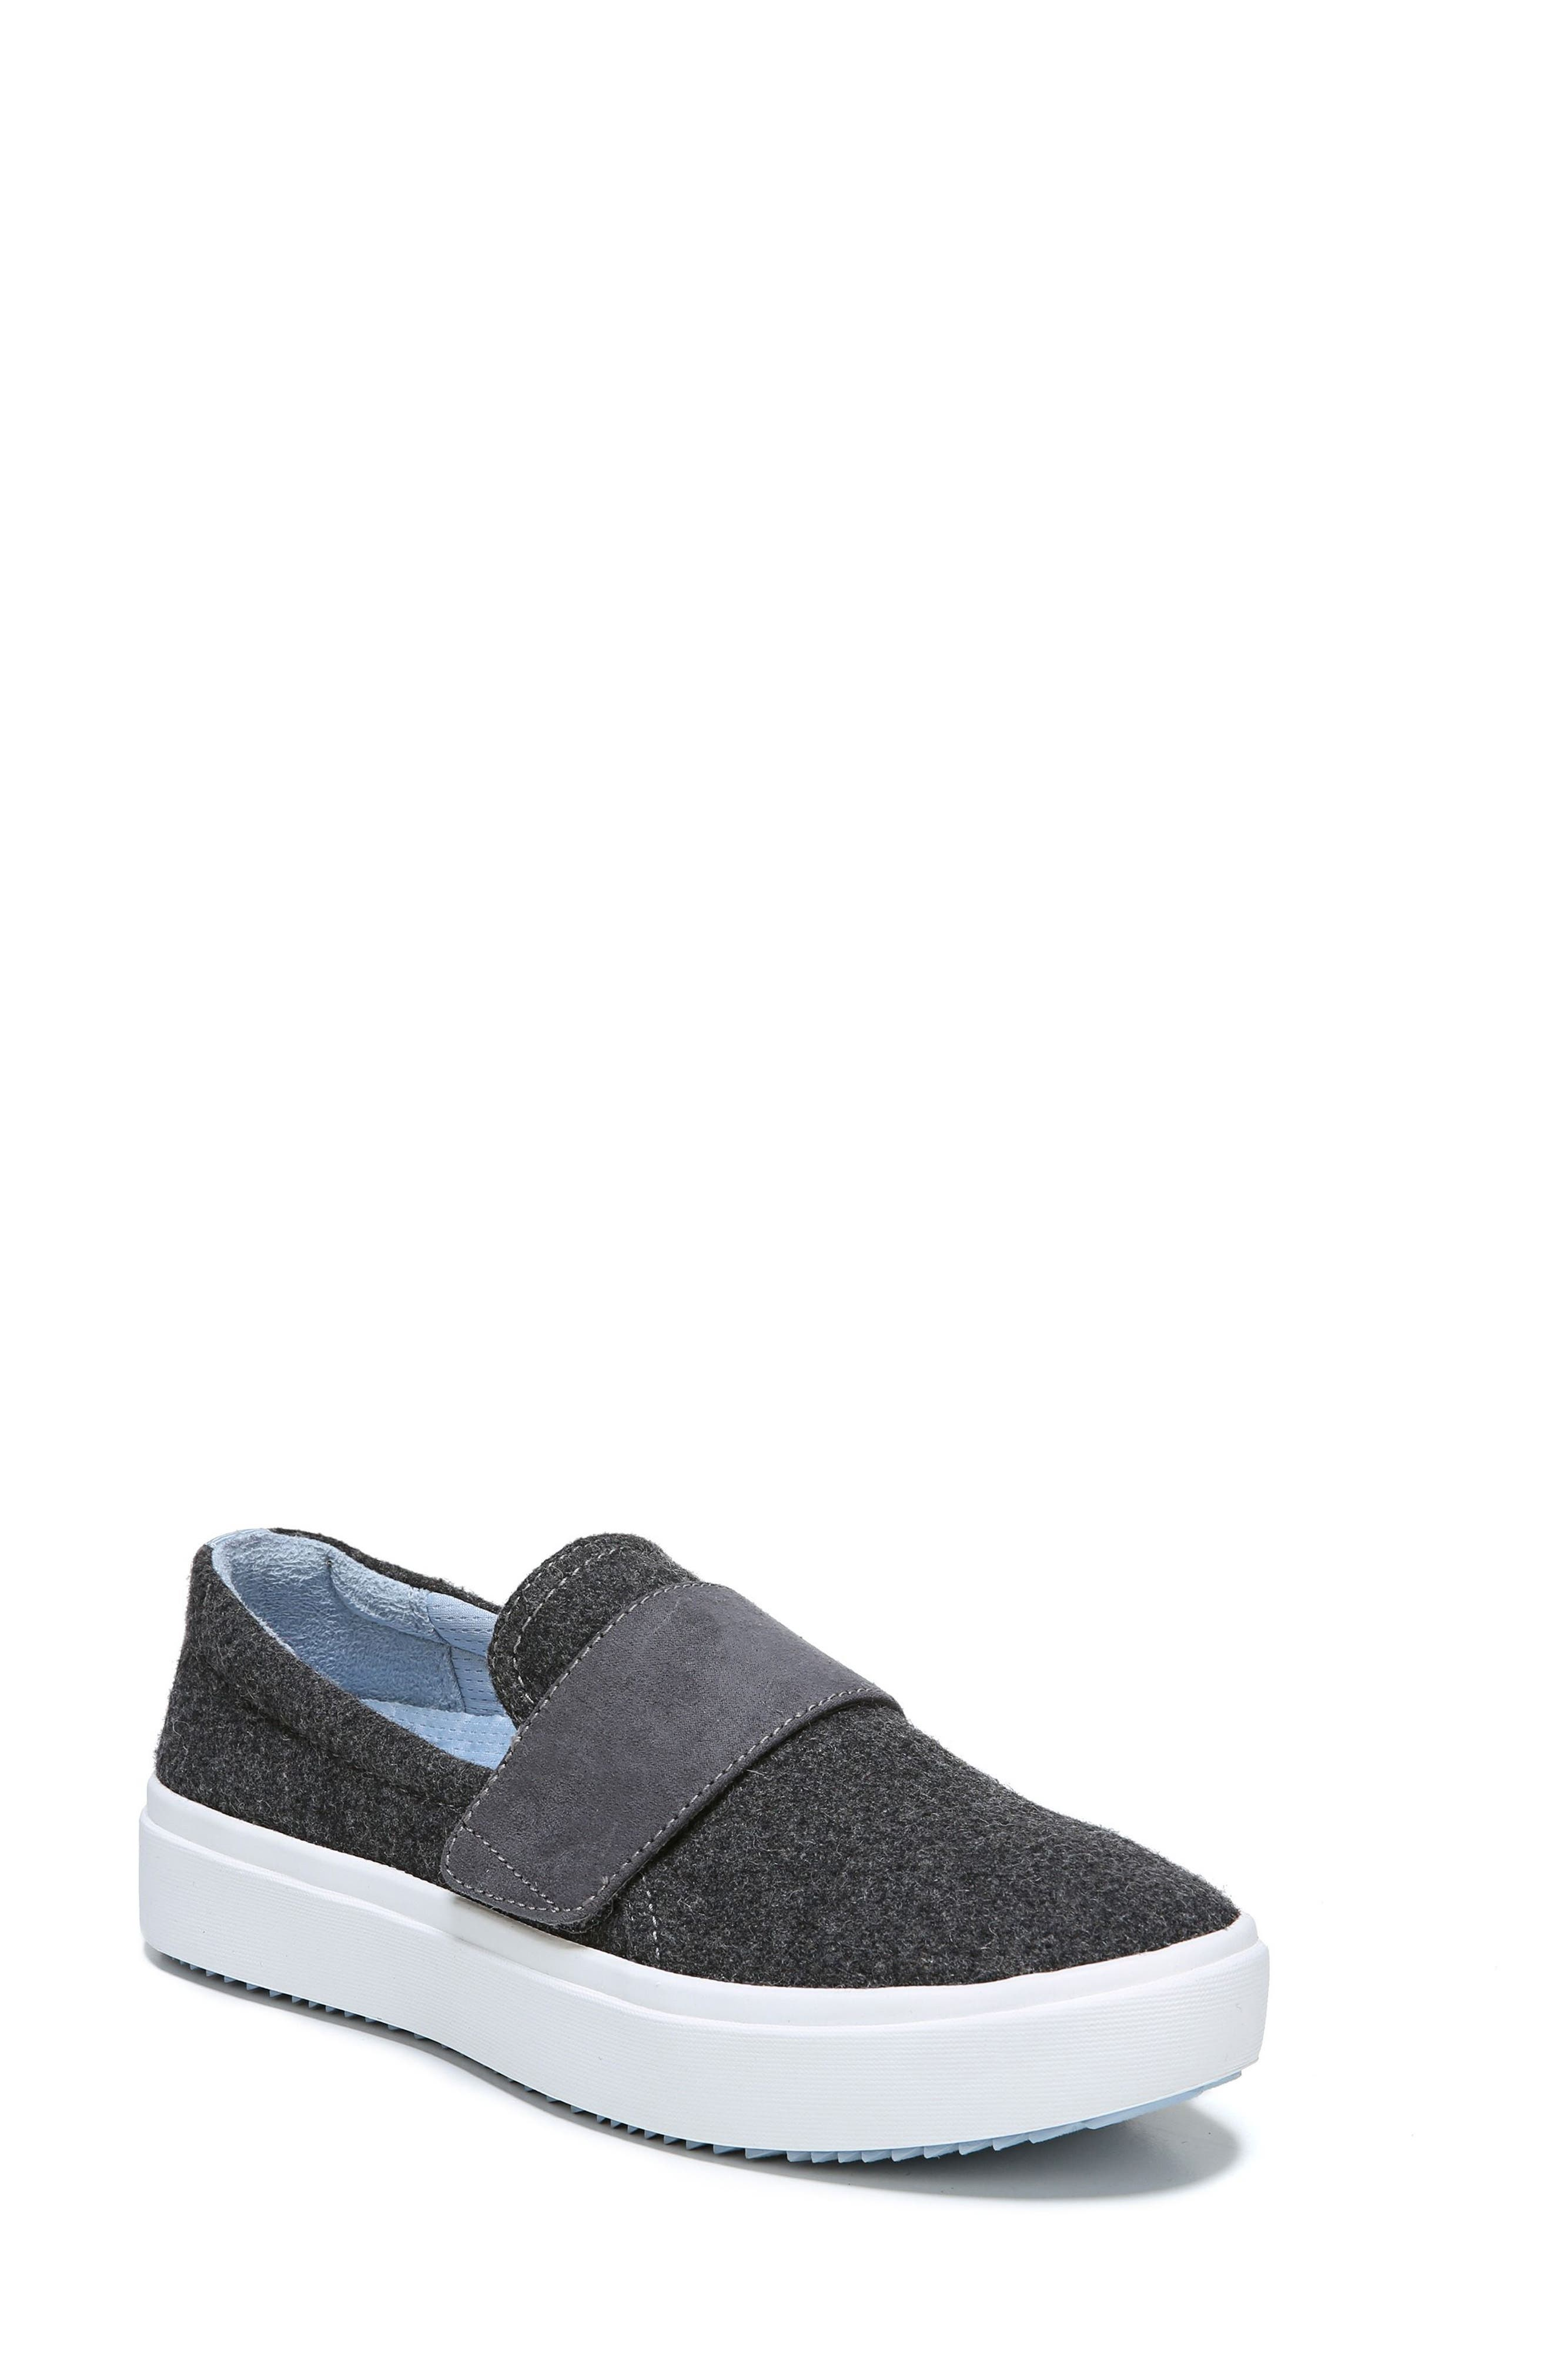 Wander Band Slip-On Sneaker,                         Main,                         color,